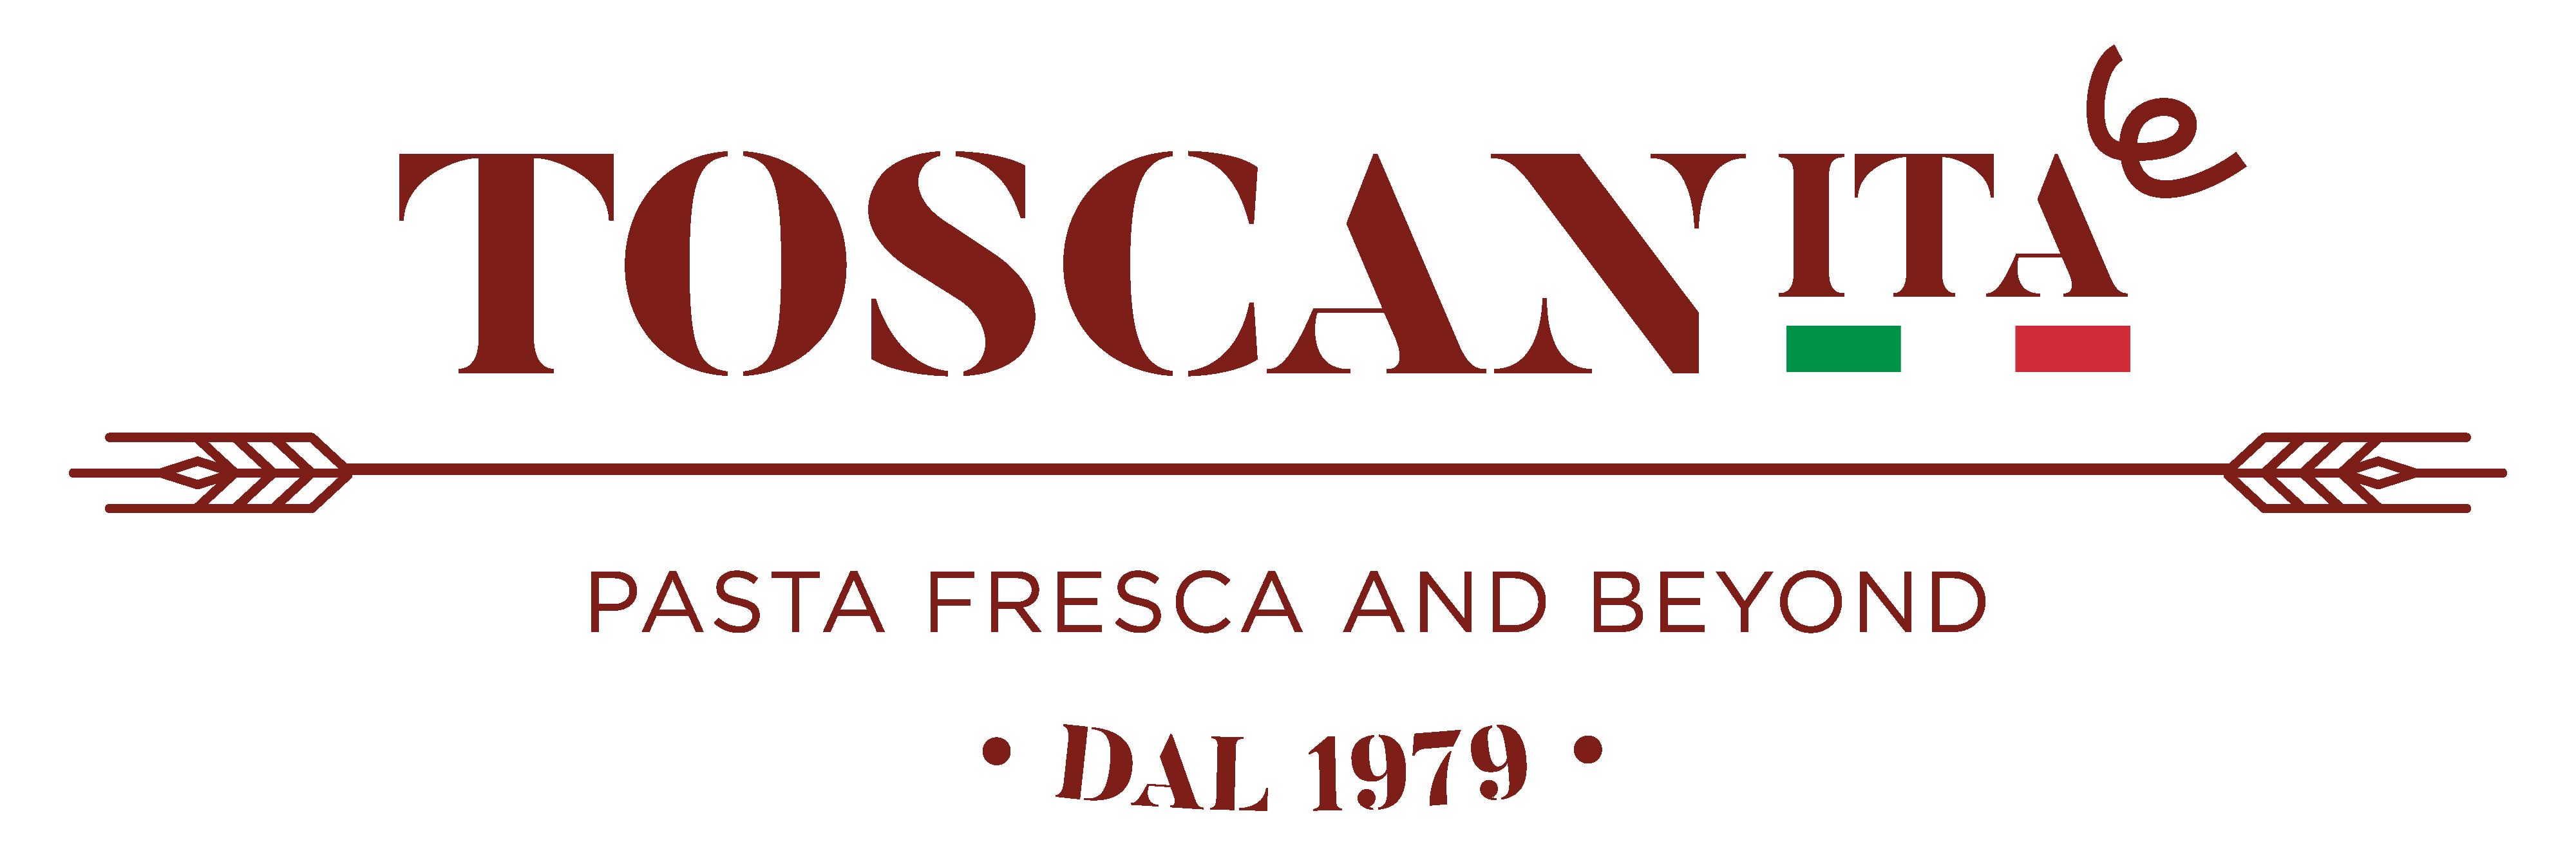 Toscanità